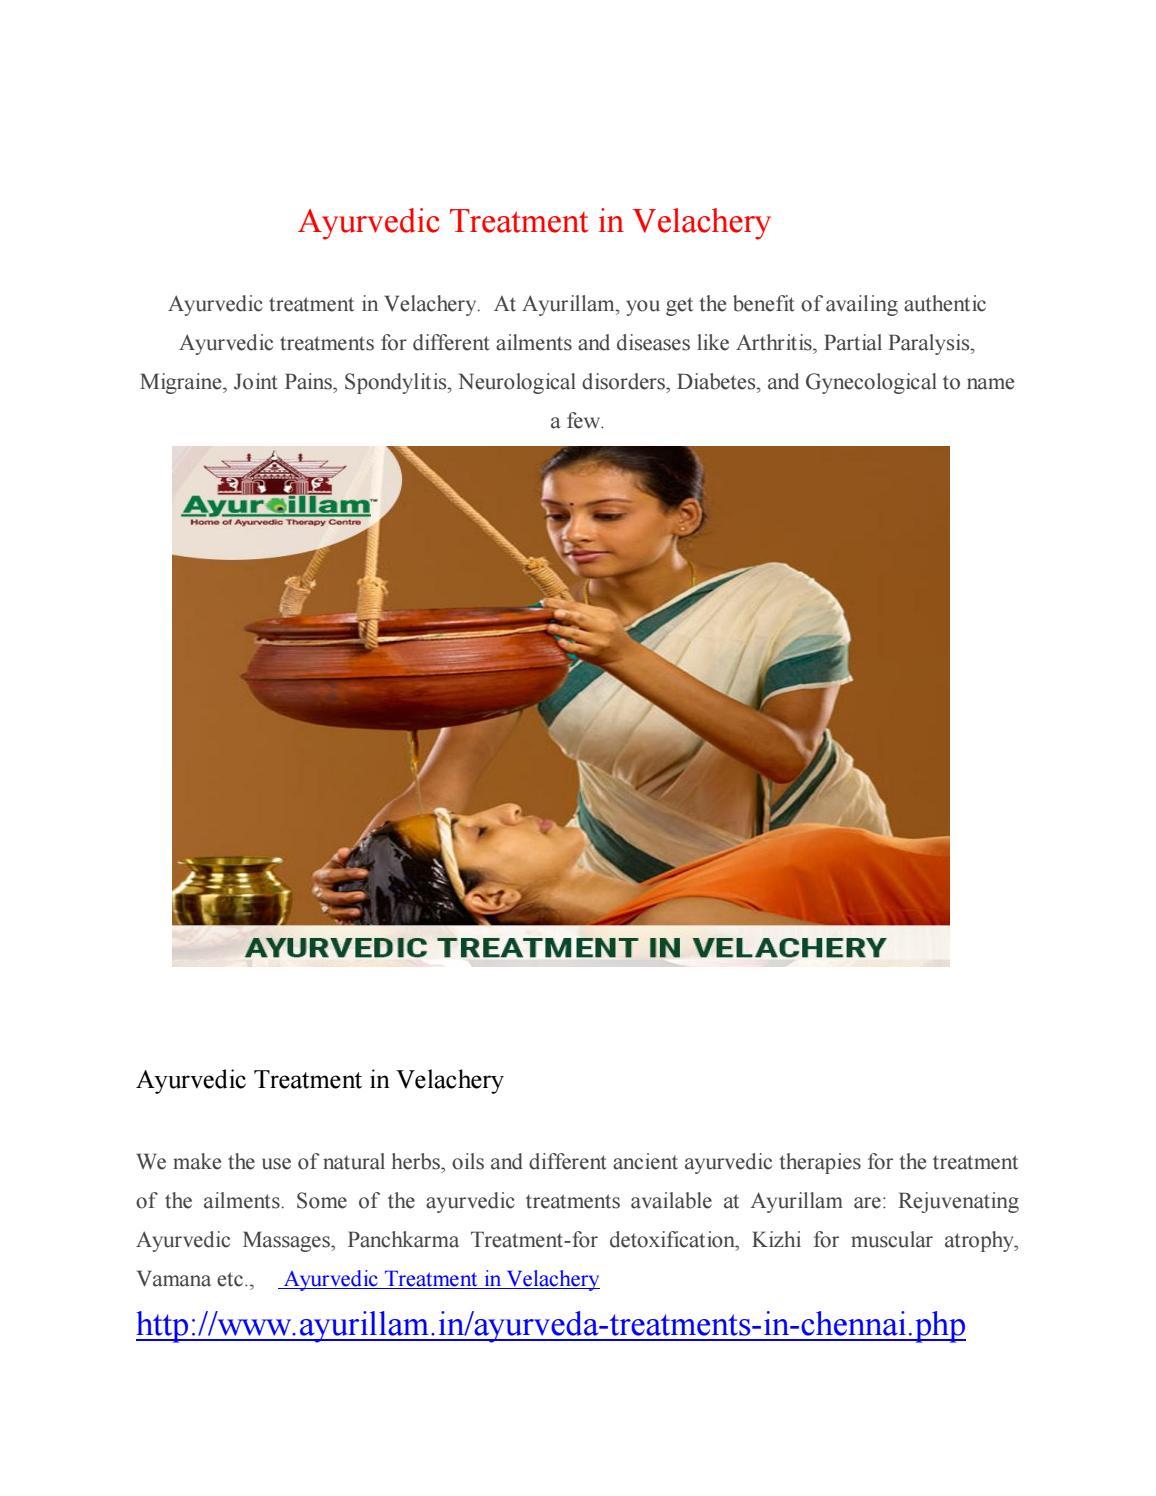 Ayurvedic treatment in velachery